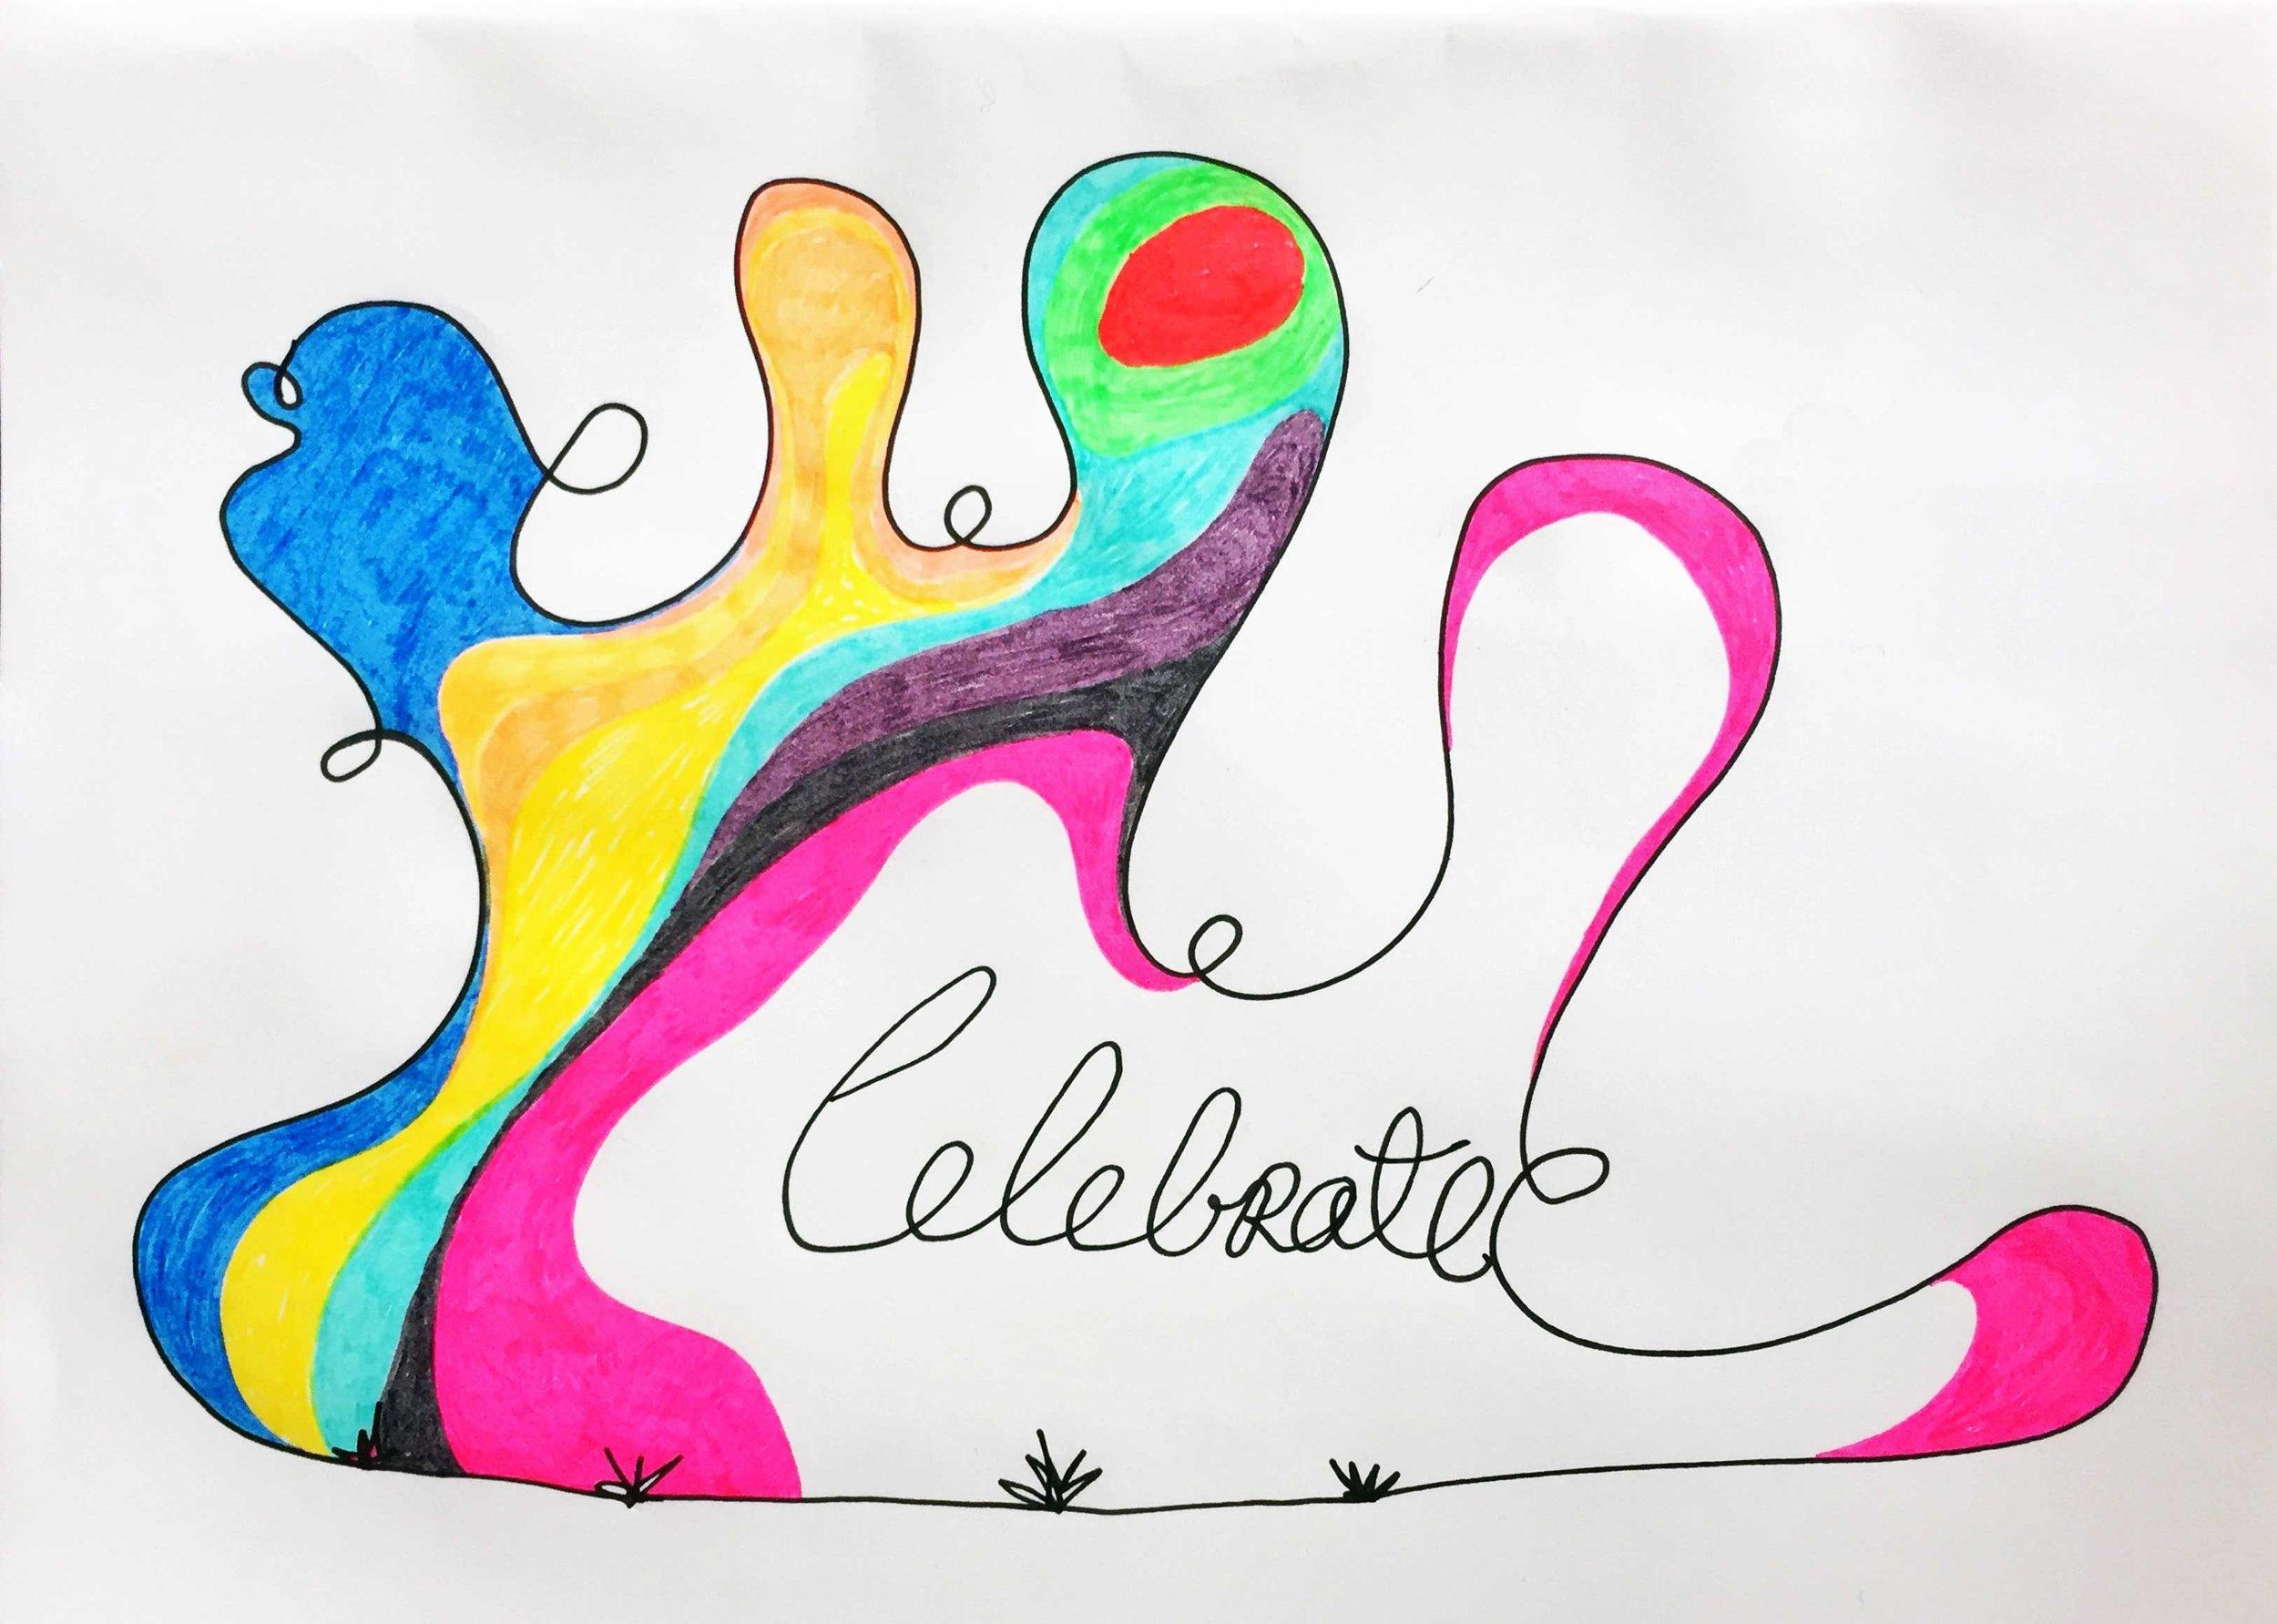 Celebrate. Drawing Luke Hockley.